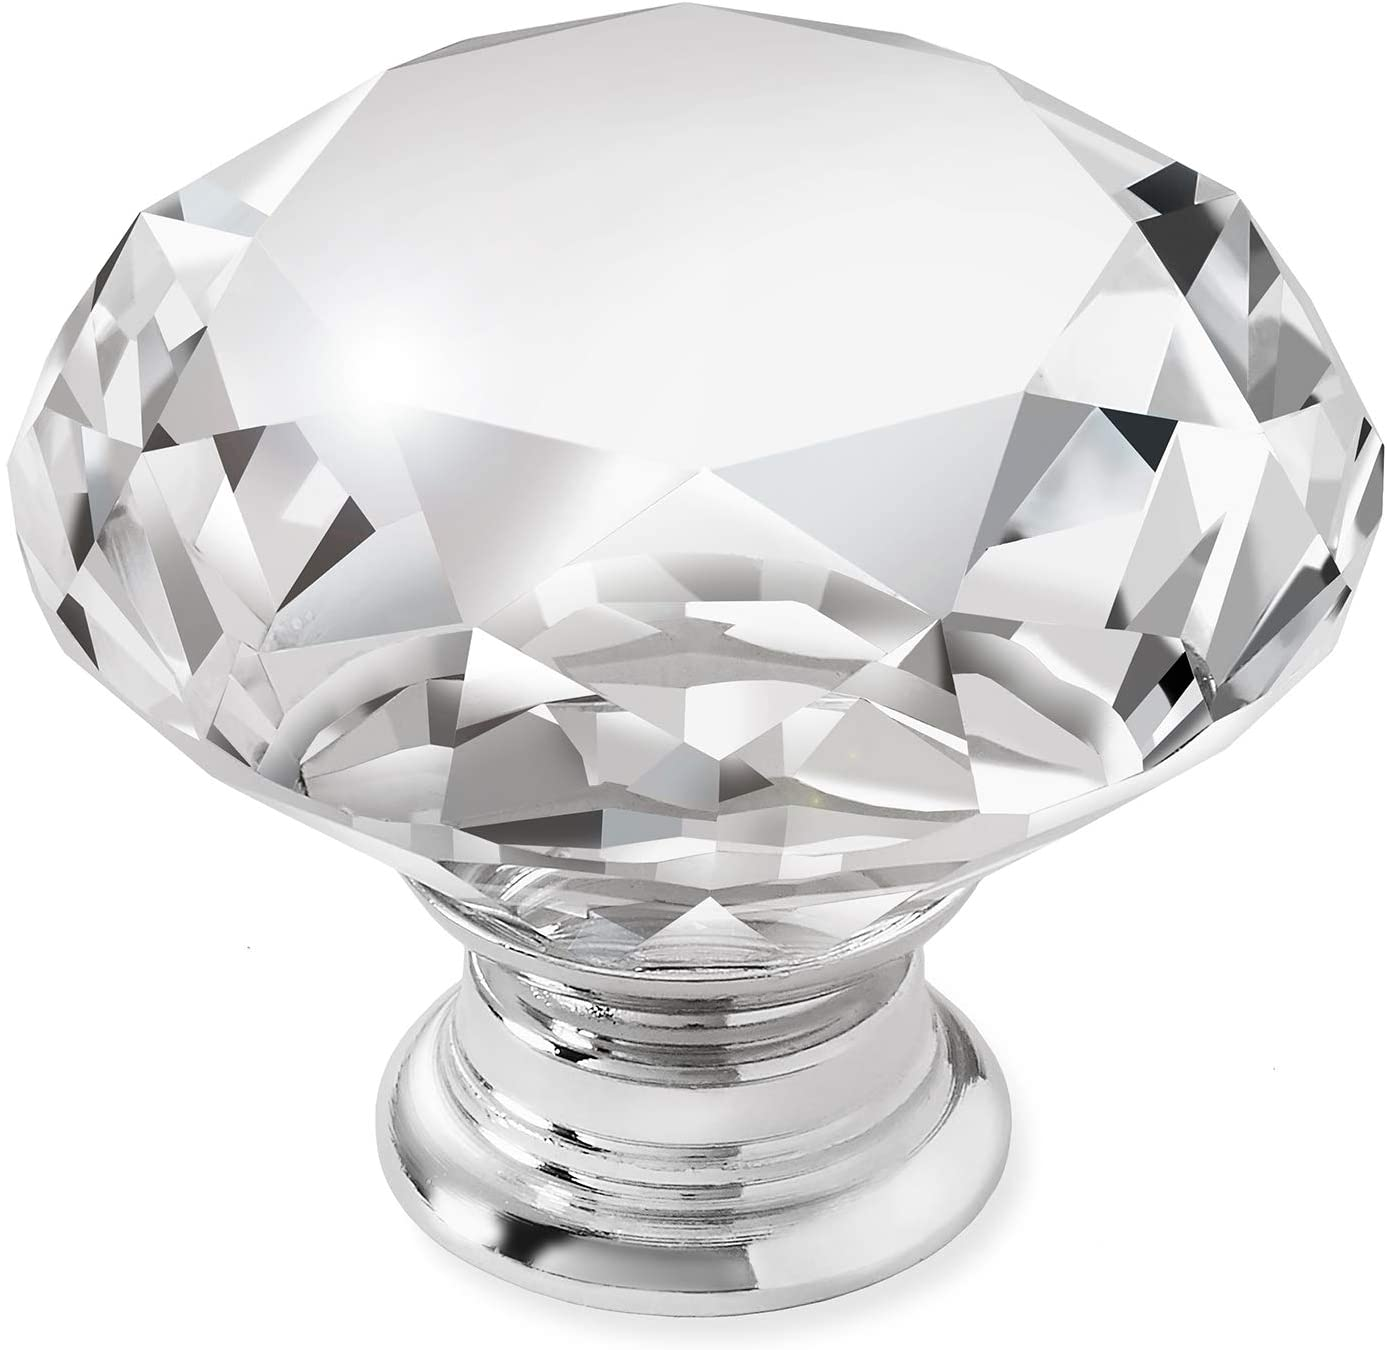 Cauldham 25 Pack Premium Glass Crystal Kitchen Cabinet Knobs Pulls (1-5/8